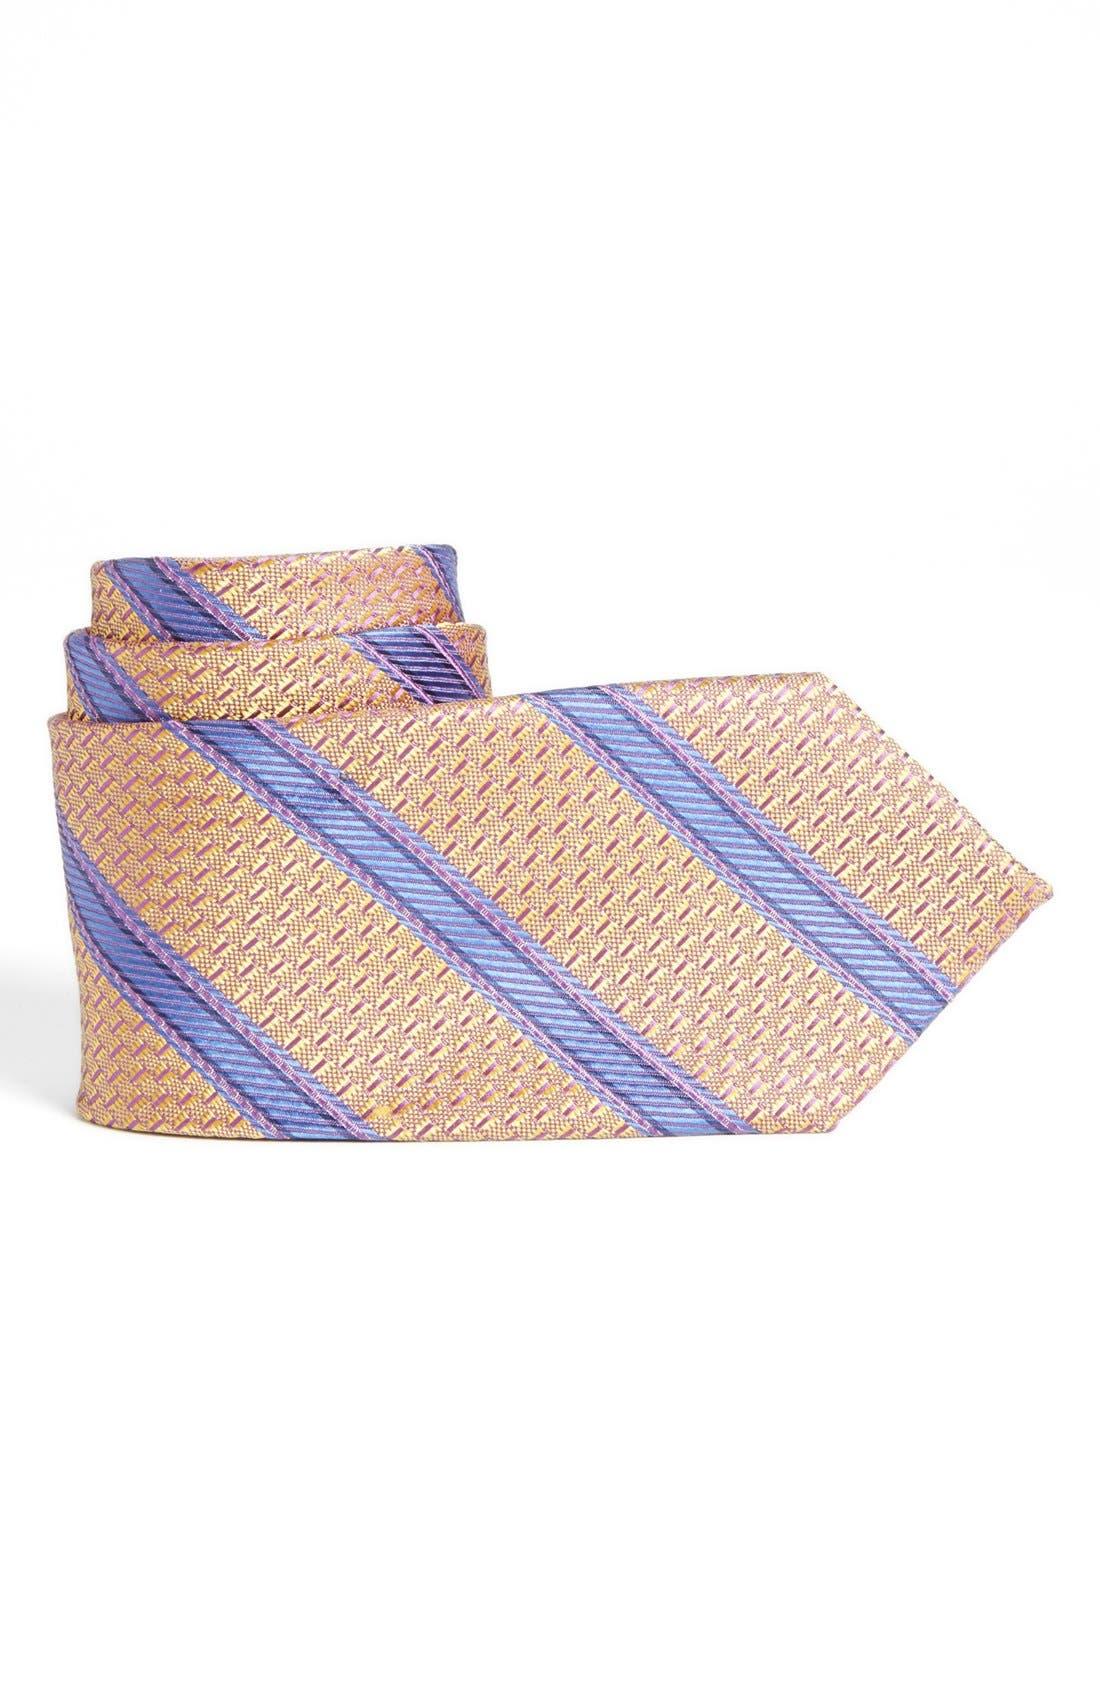 Alternate Image 1 Selected - Joseph Abboud Stripe Woven Silk Tie (Boys)